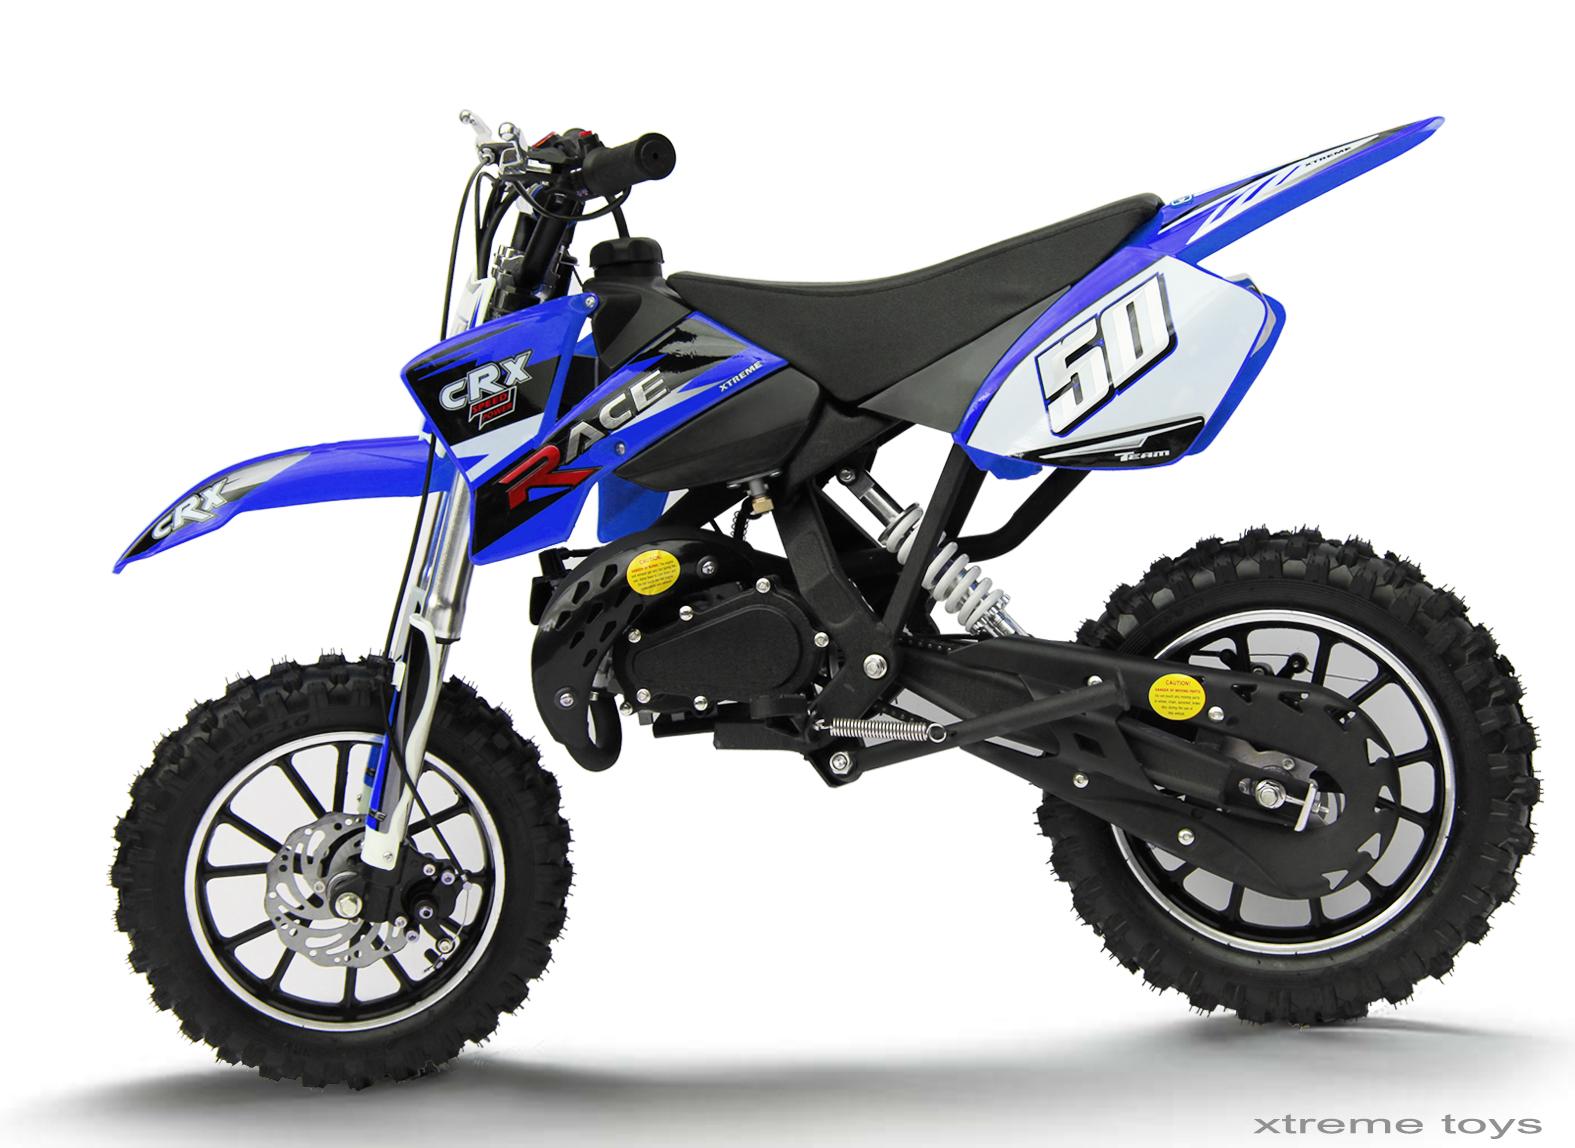 50 cc mini dirt bike http www xtreme toys co uk crx50cc dirt bike